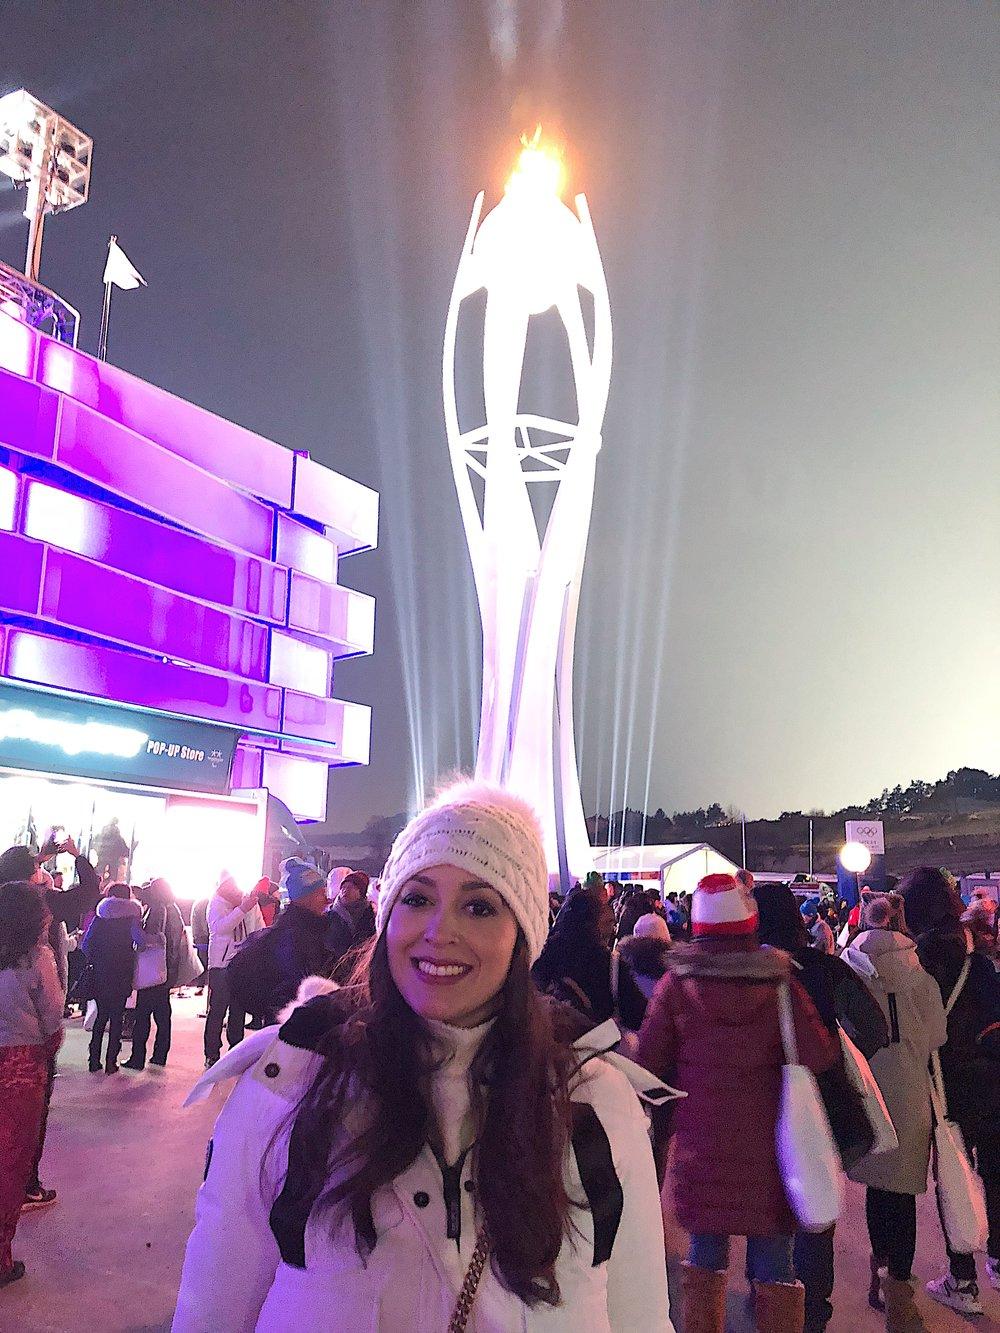 Winter Olympics Games Spanglishfashion 2018 (22).JPG